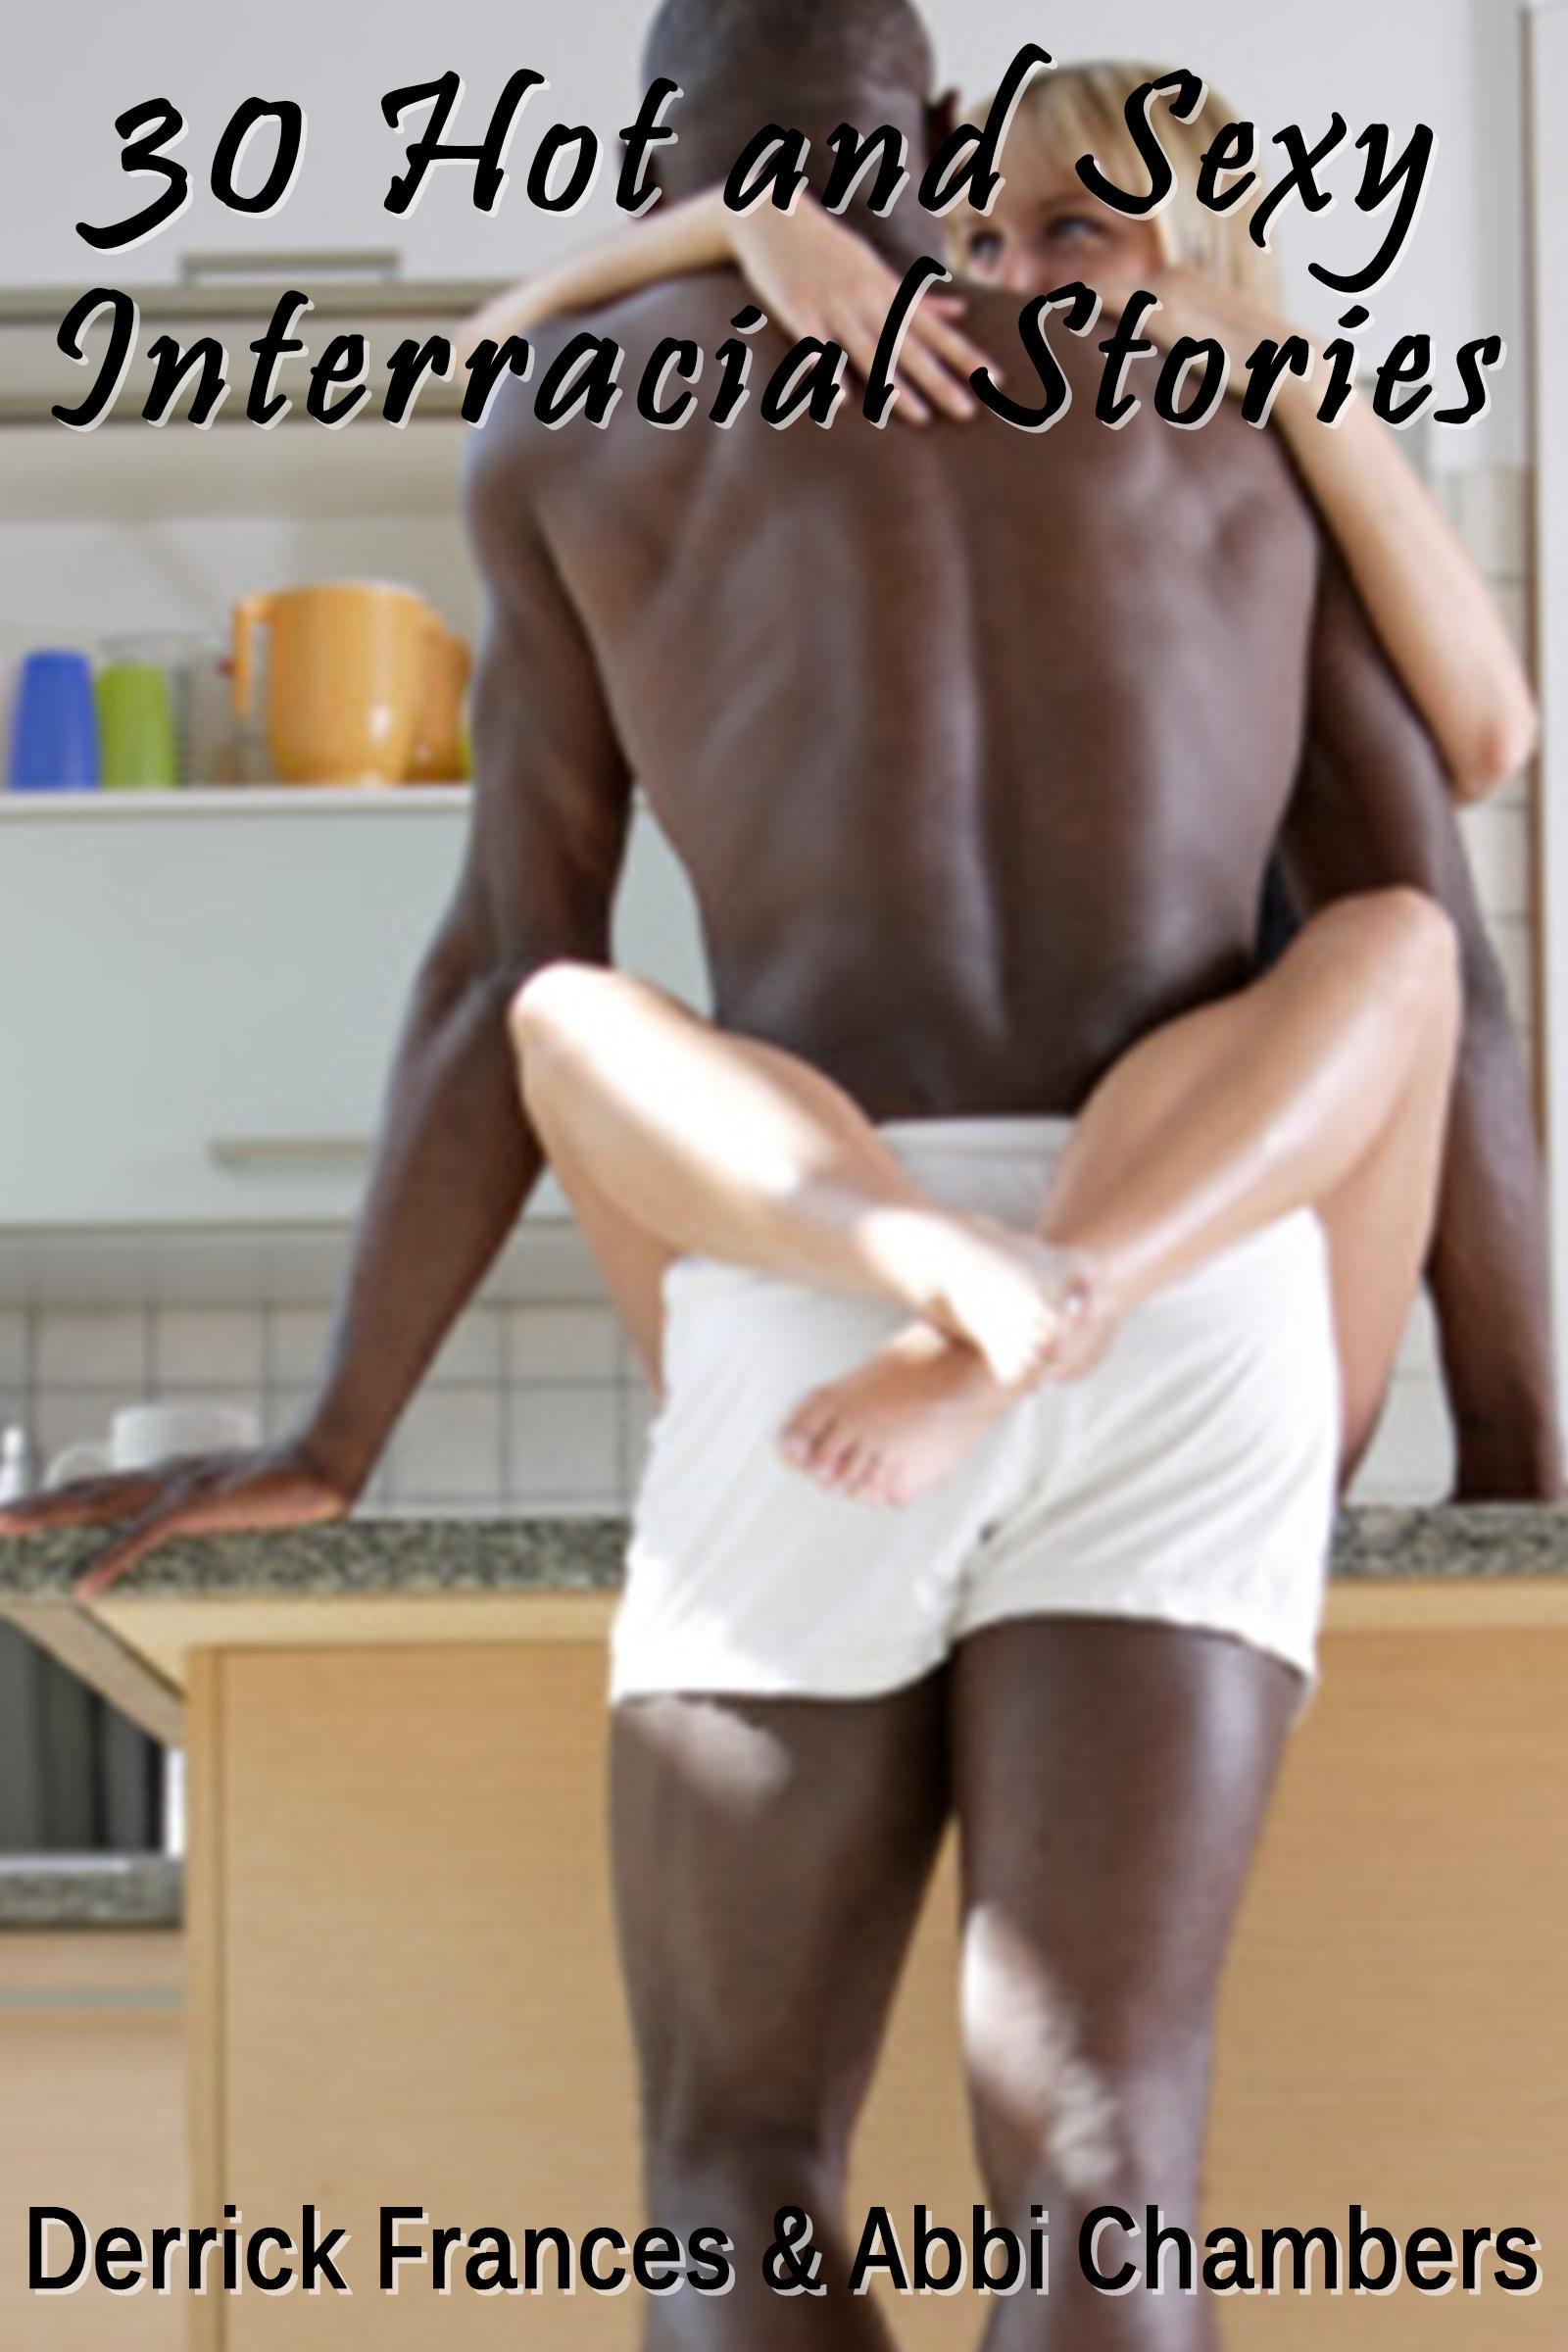 best of Interracial stories Hot